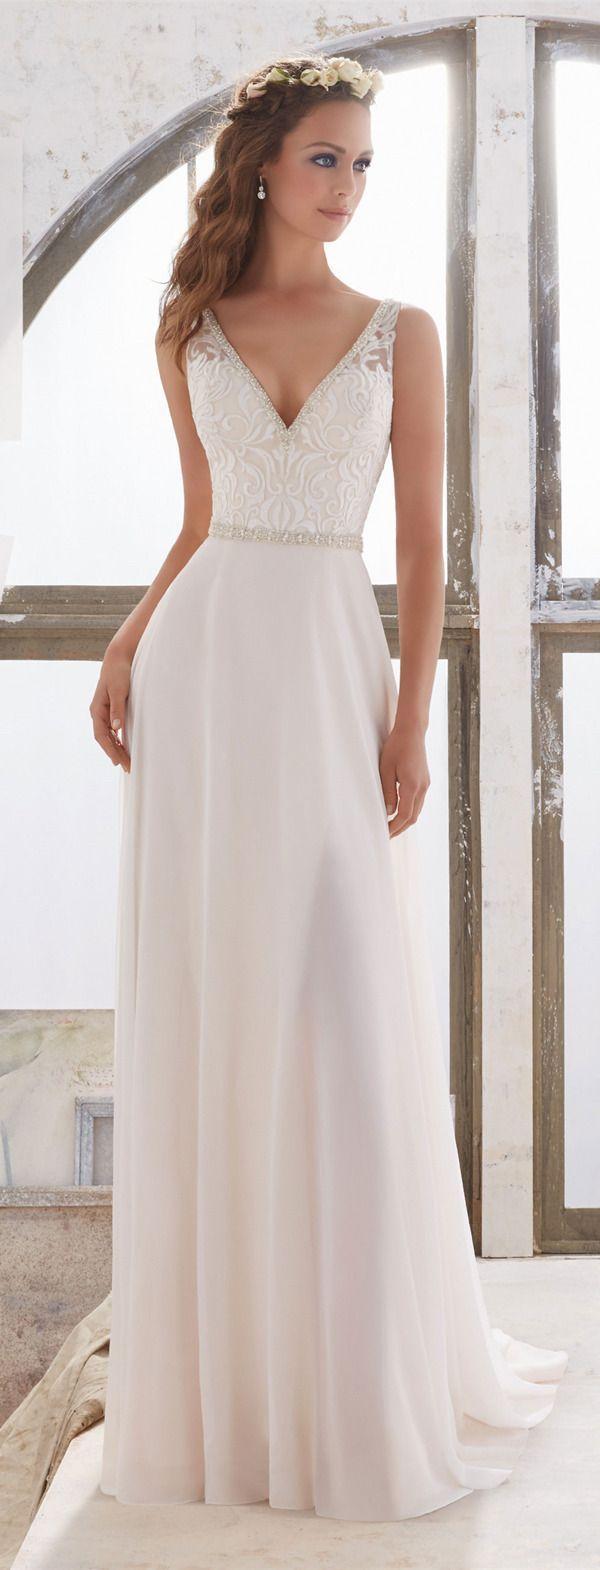 Vestidos de novia sencillos | Boda | Pinterest | Vestidos de novia ...